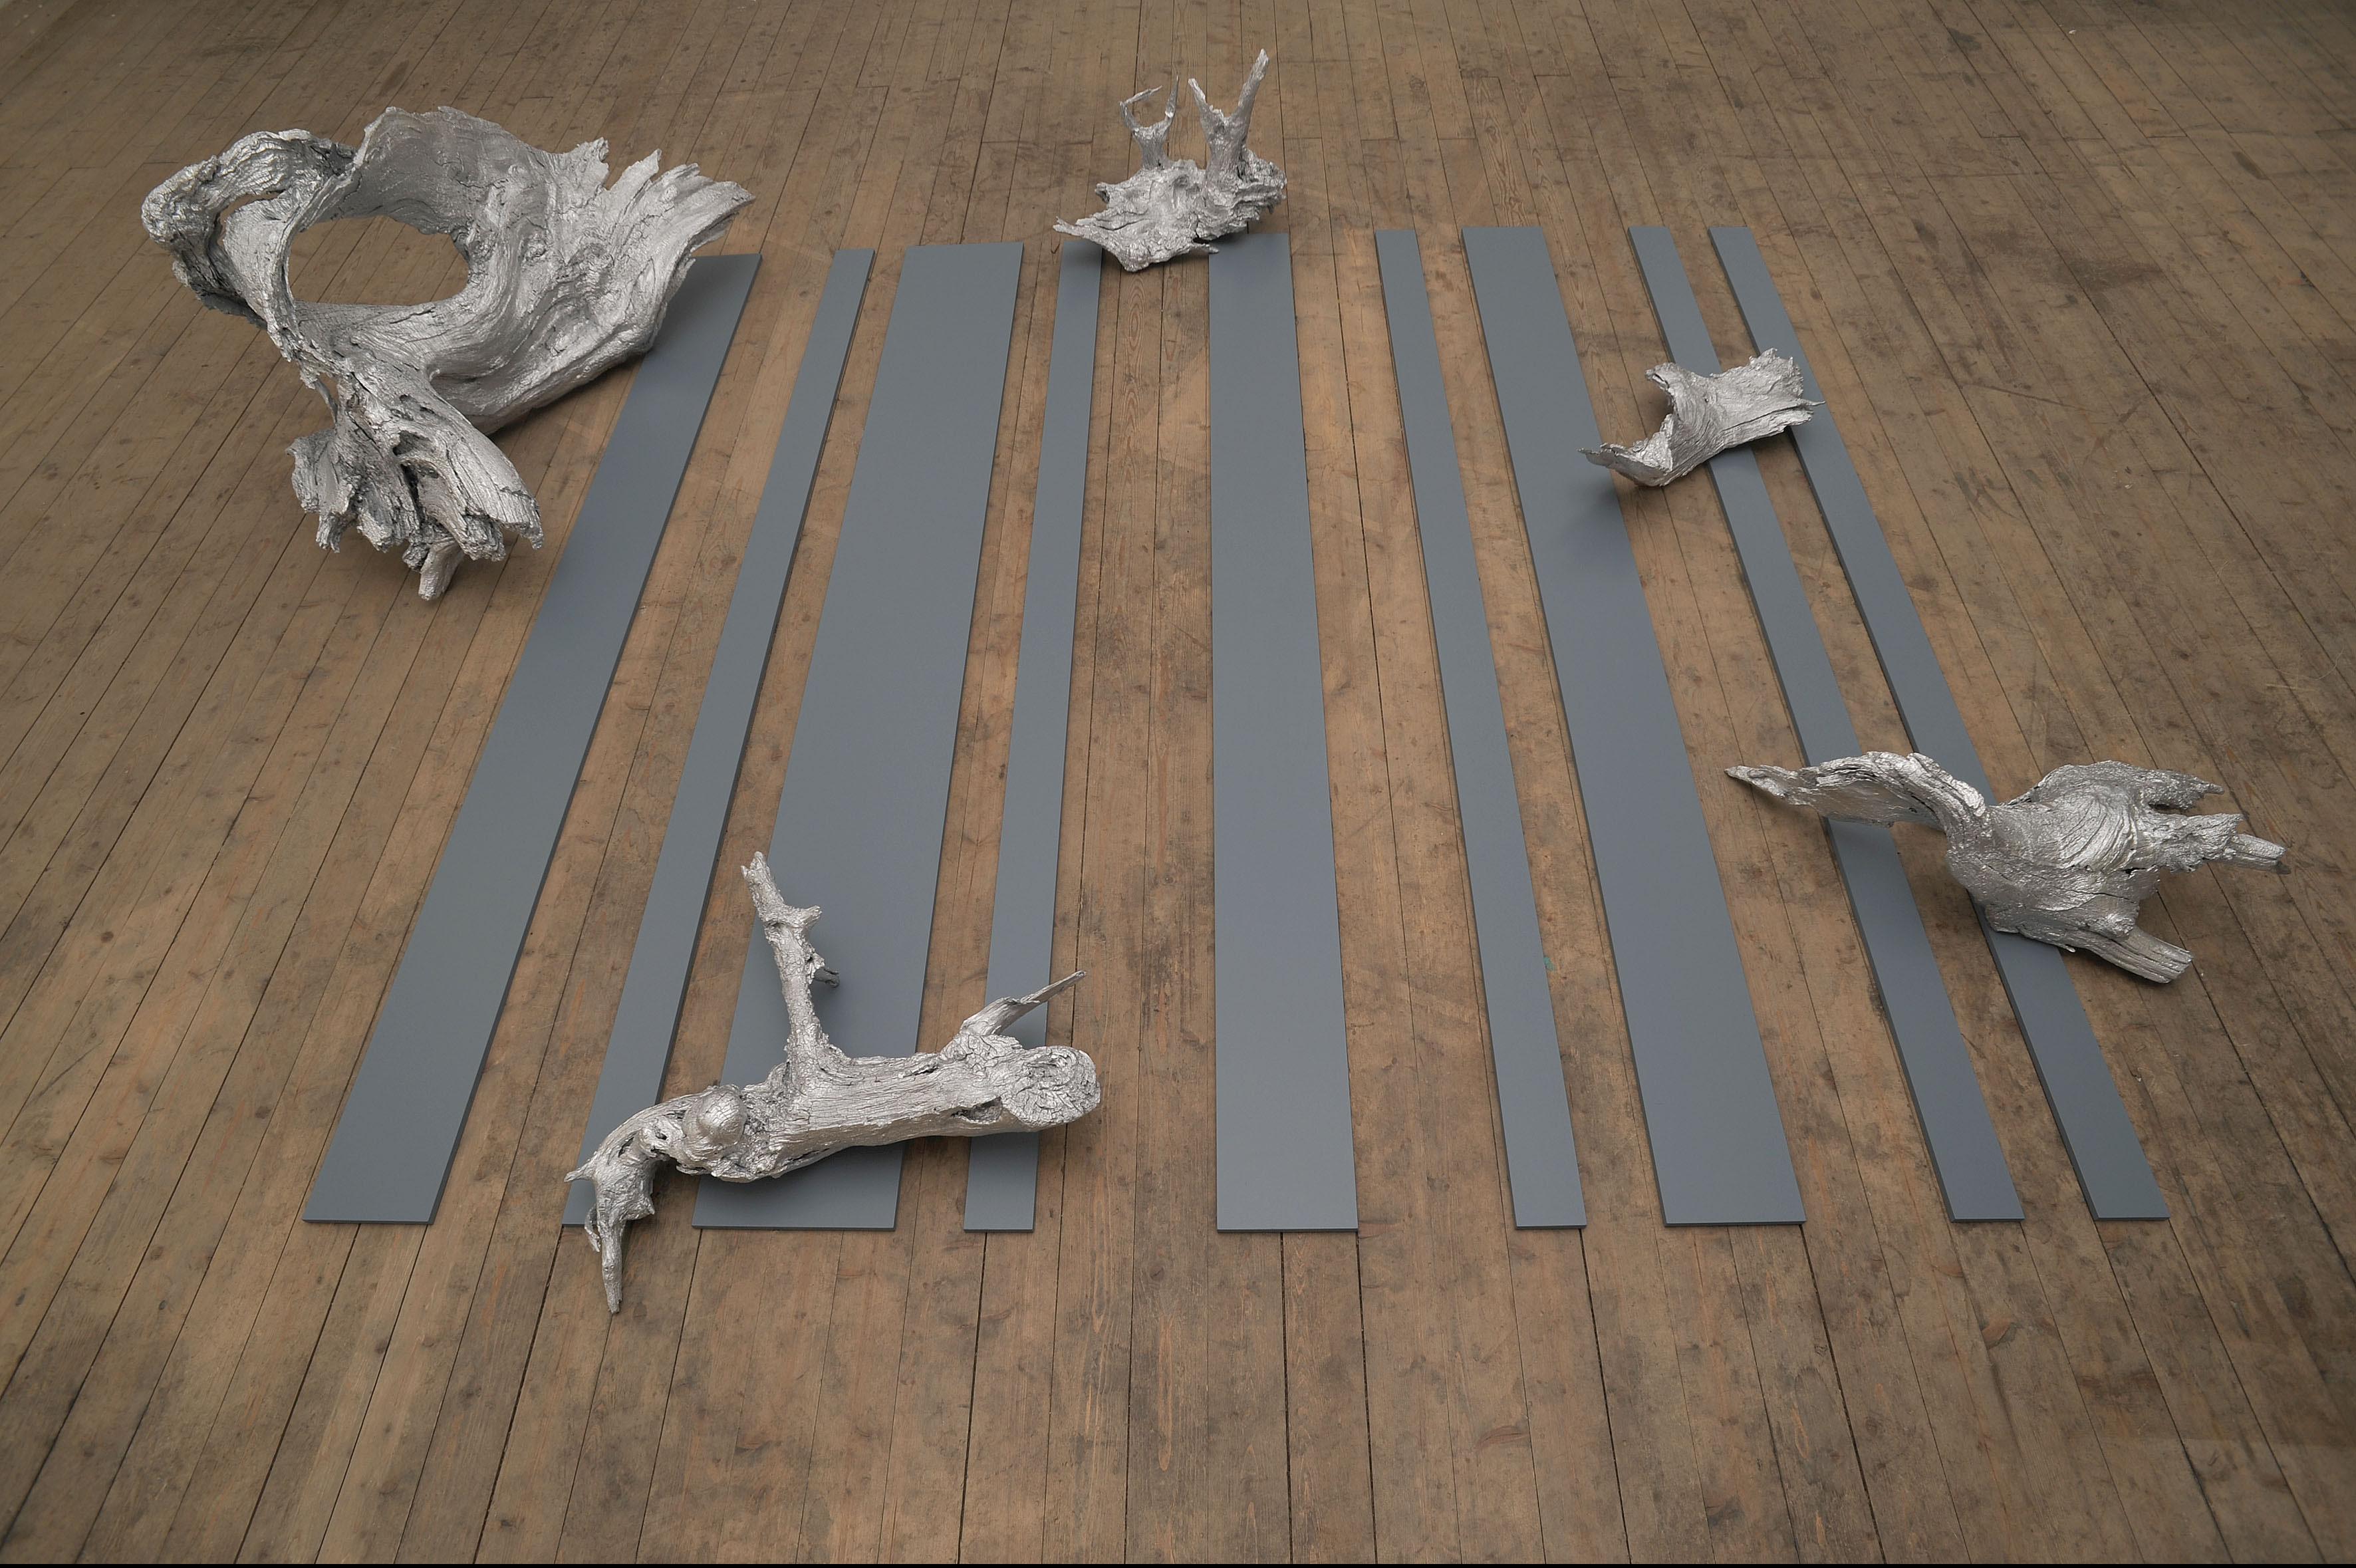 Gabriele Künne, Passaggio, Wurzeln, Aluminiumlack, MDF, Lack ca. 60 x 260 x 210 cm, 2008